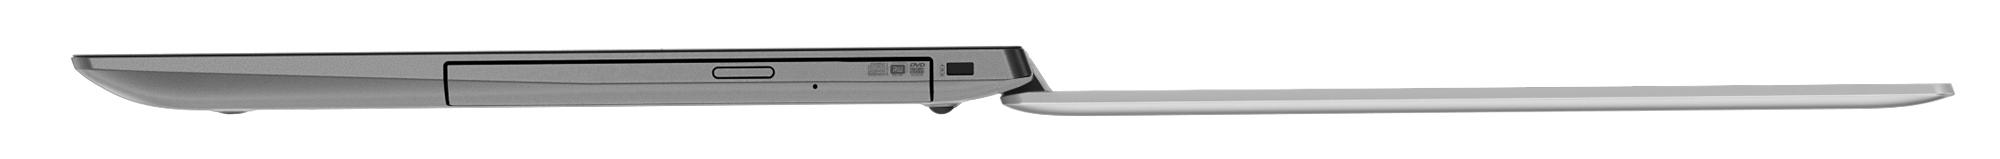 Фото  Ноутбук Lenovo ideapad 330-15 Platinum Grey (81DC009JRA)